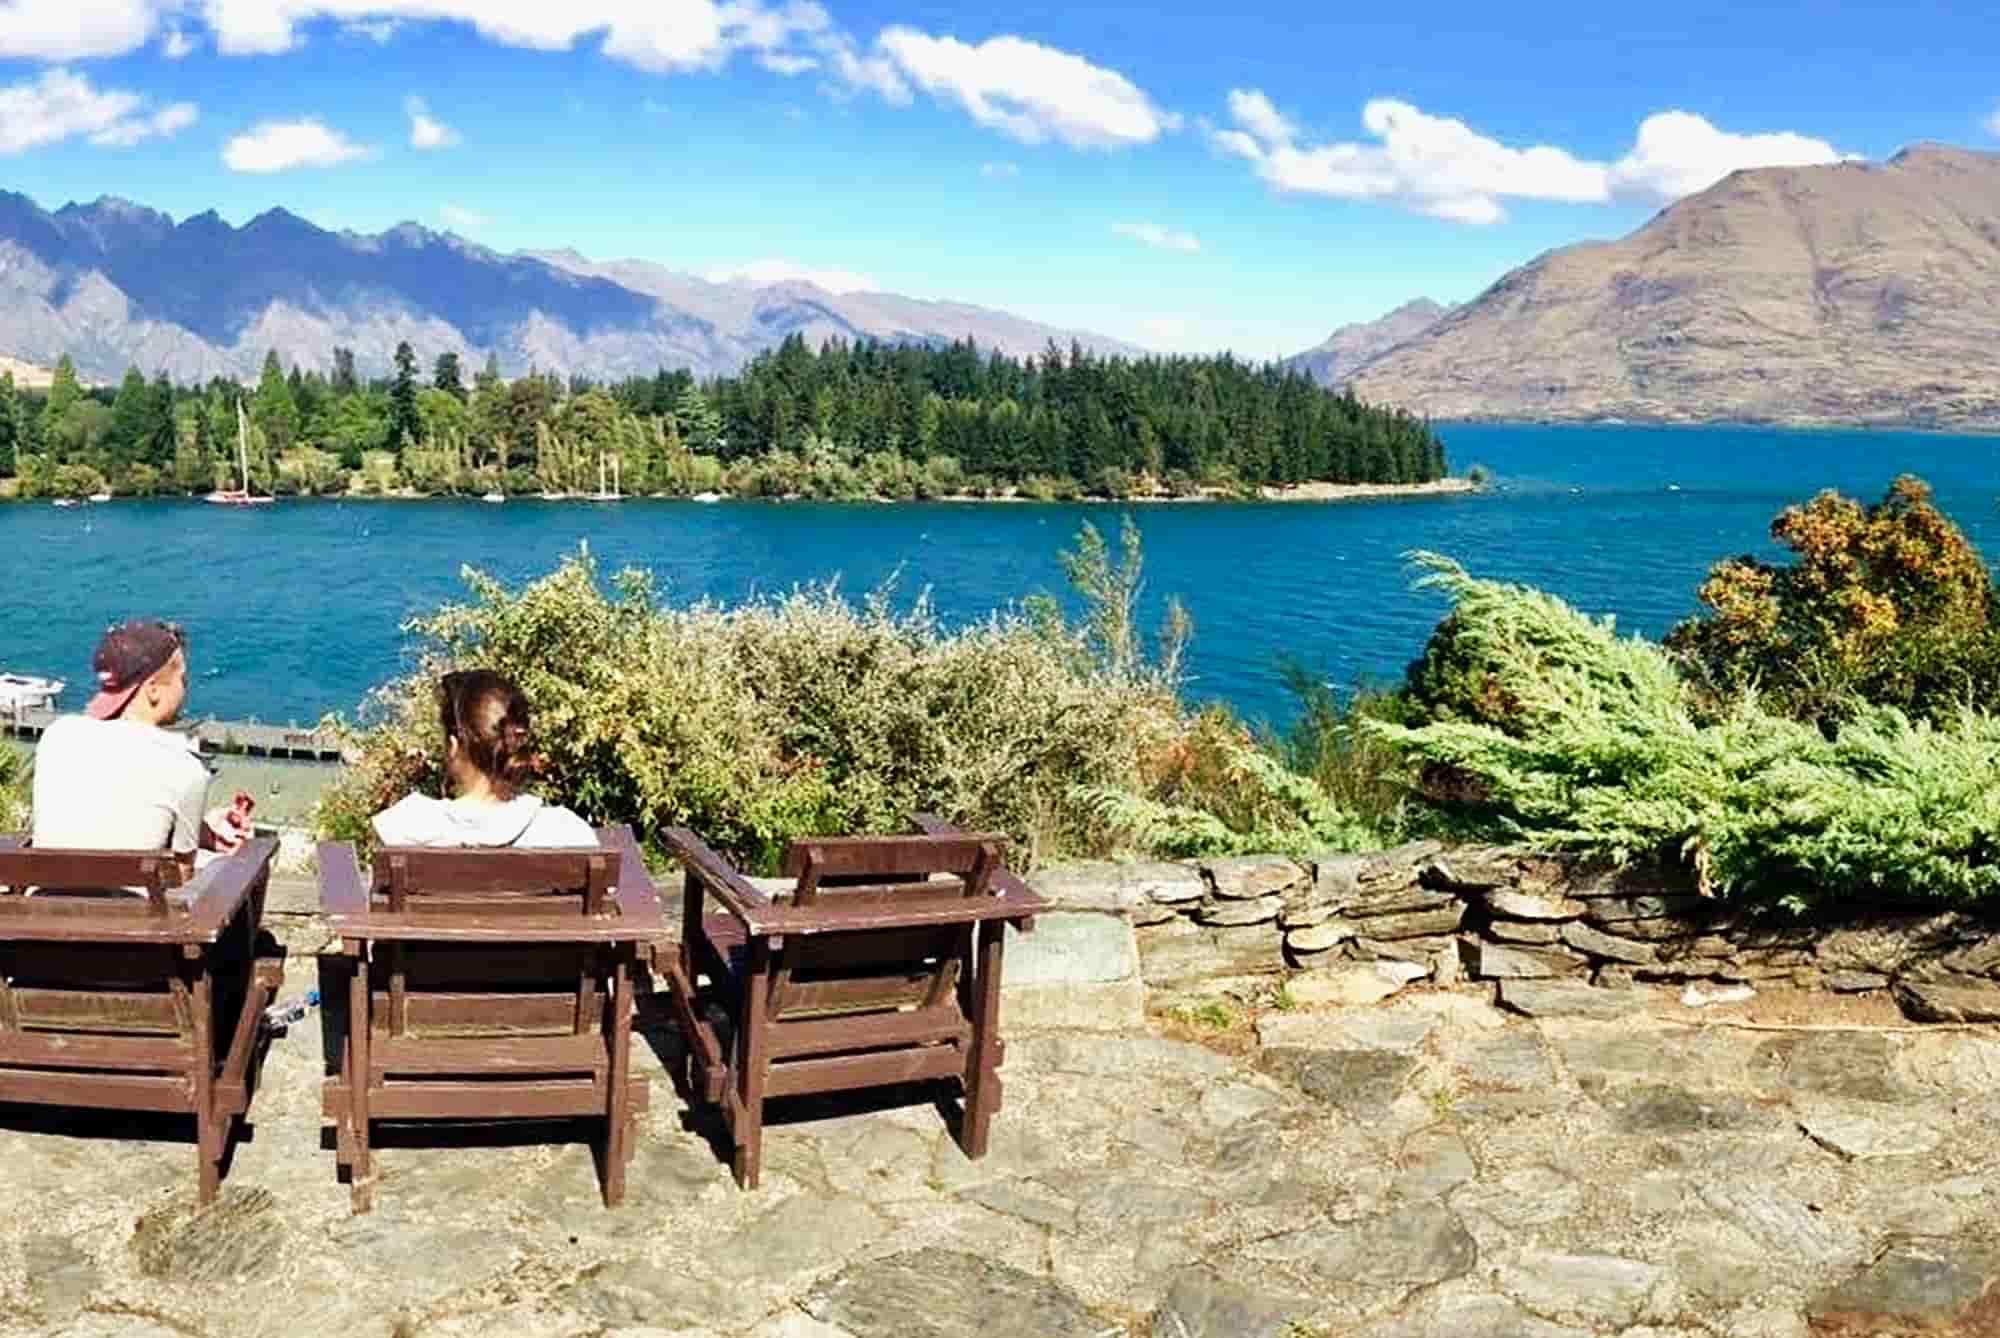 Voyage en Nouvelle-Zélande - Lac Wakatipu - Amplitudes